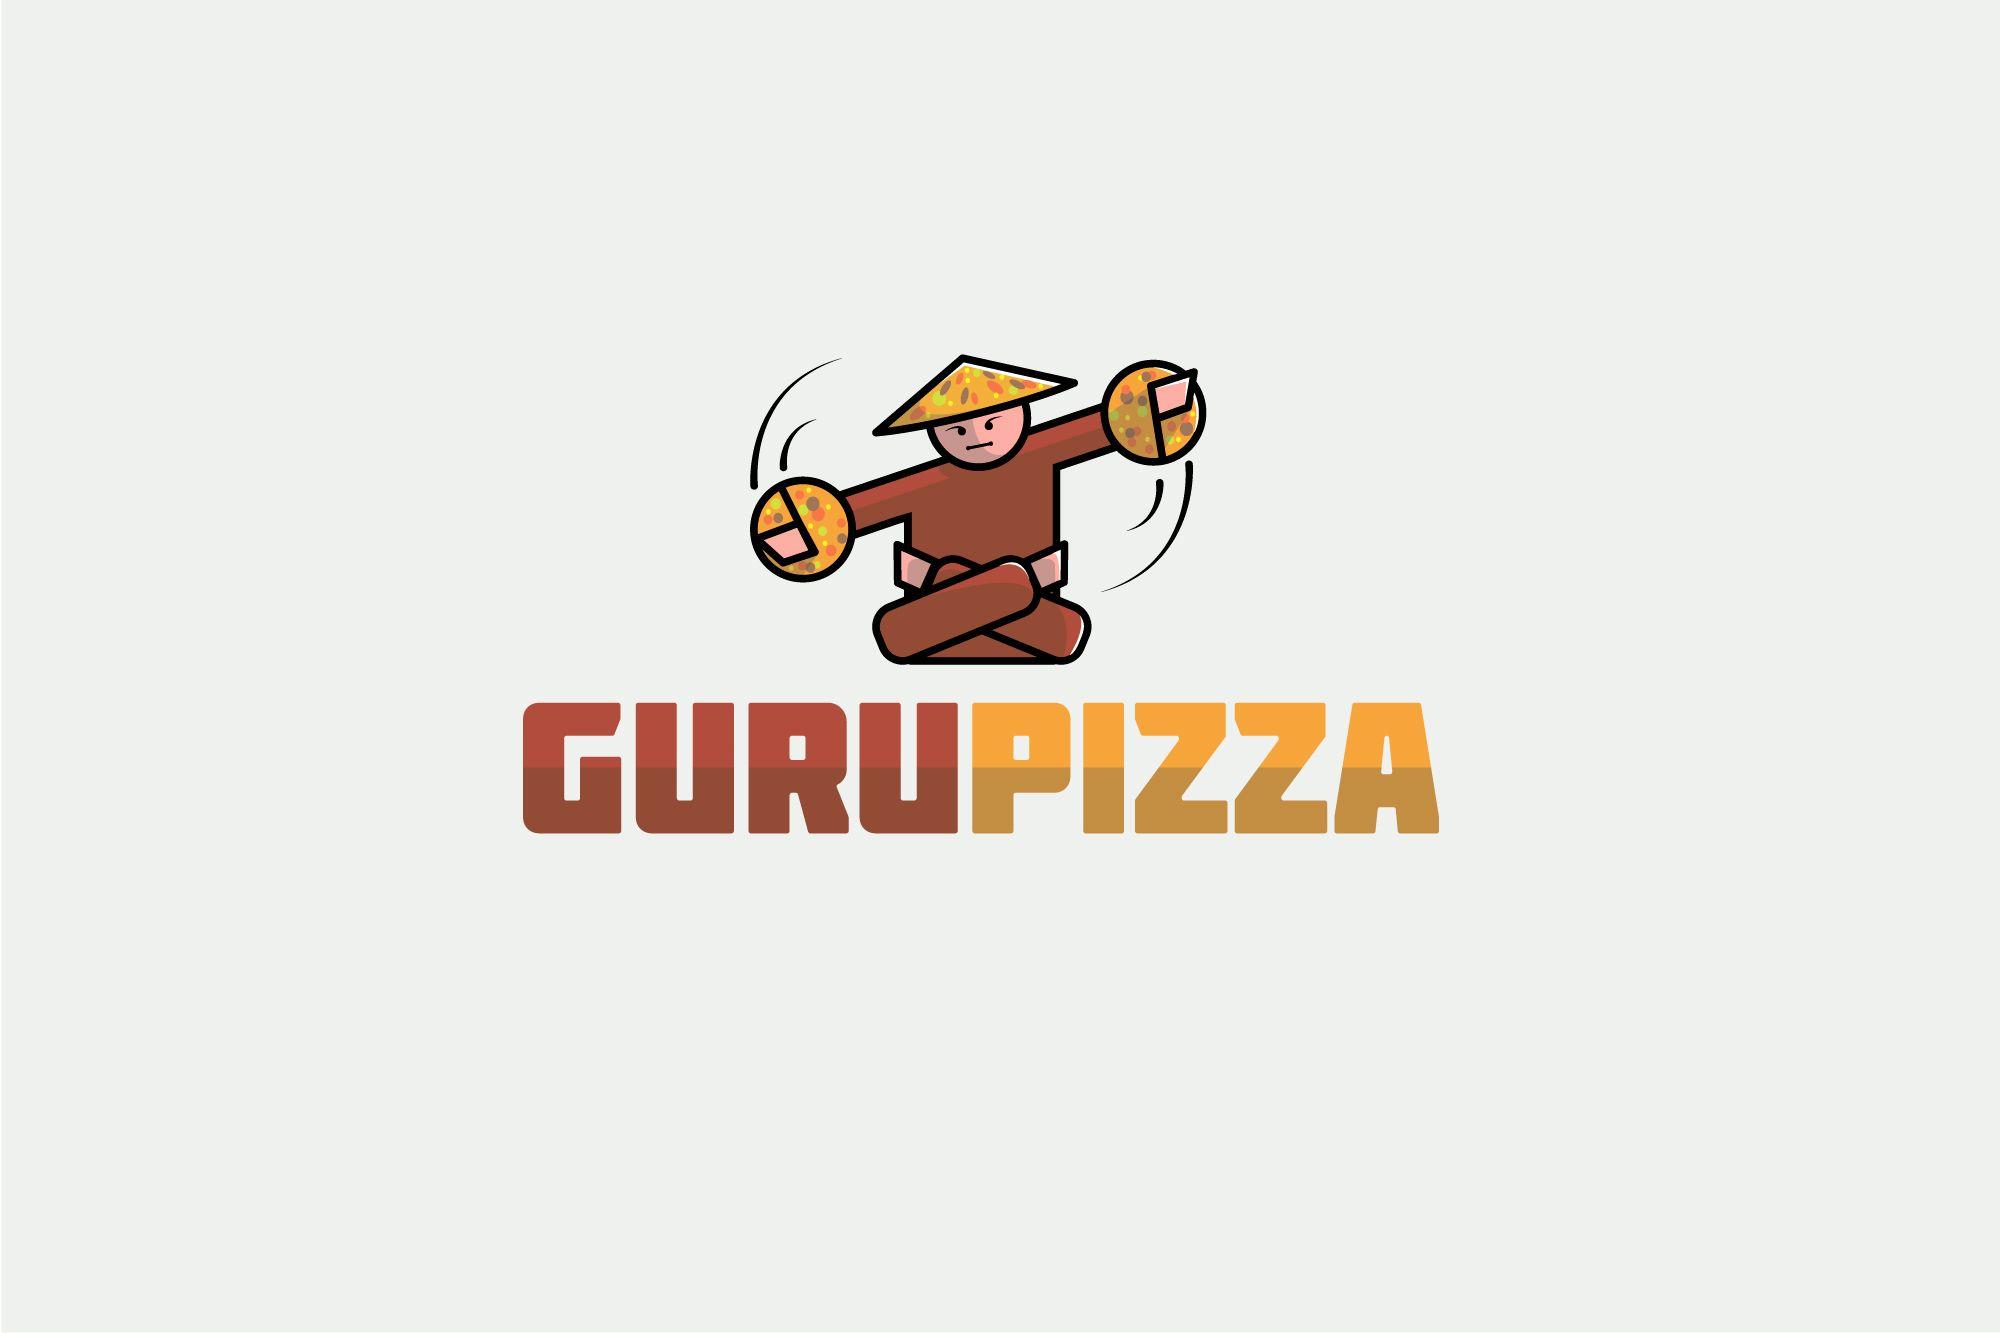 Логотип для GURUPIZZA - дизайнер BorushkovV